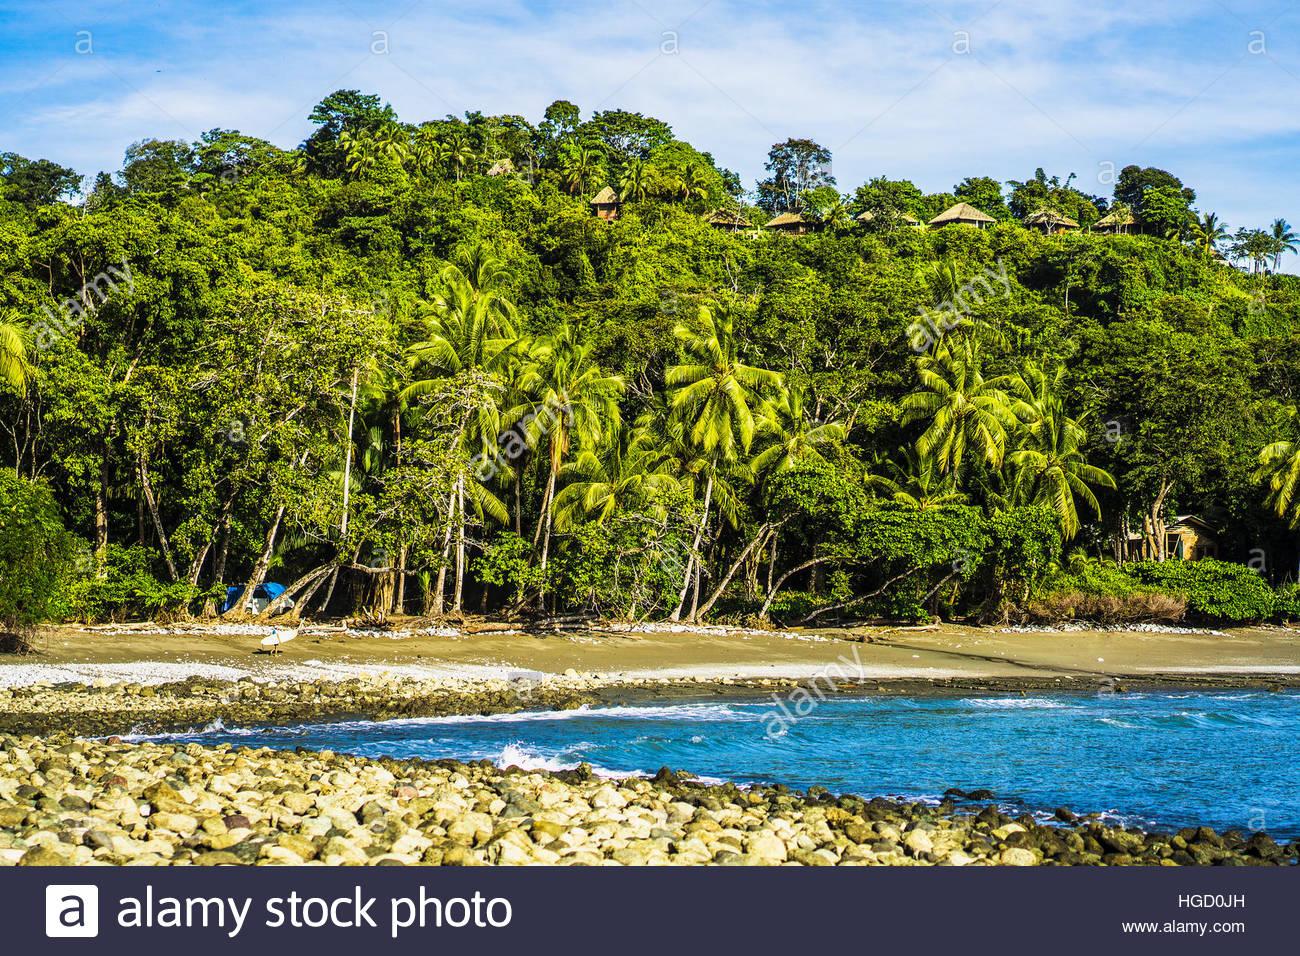 Exploring the rural coast of Costa rica, Osa peninsula, Costa rica, Central America 2015 - Stock Image